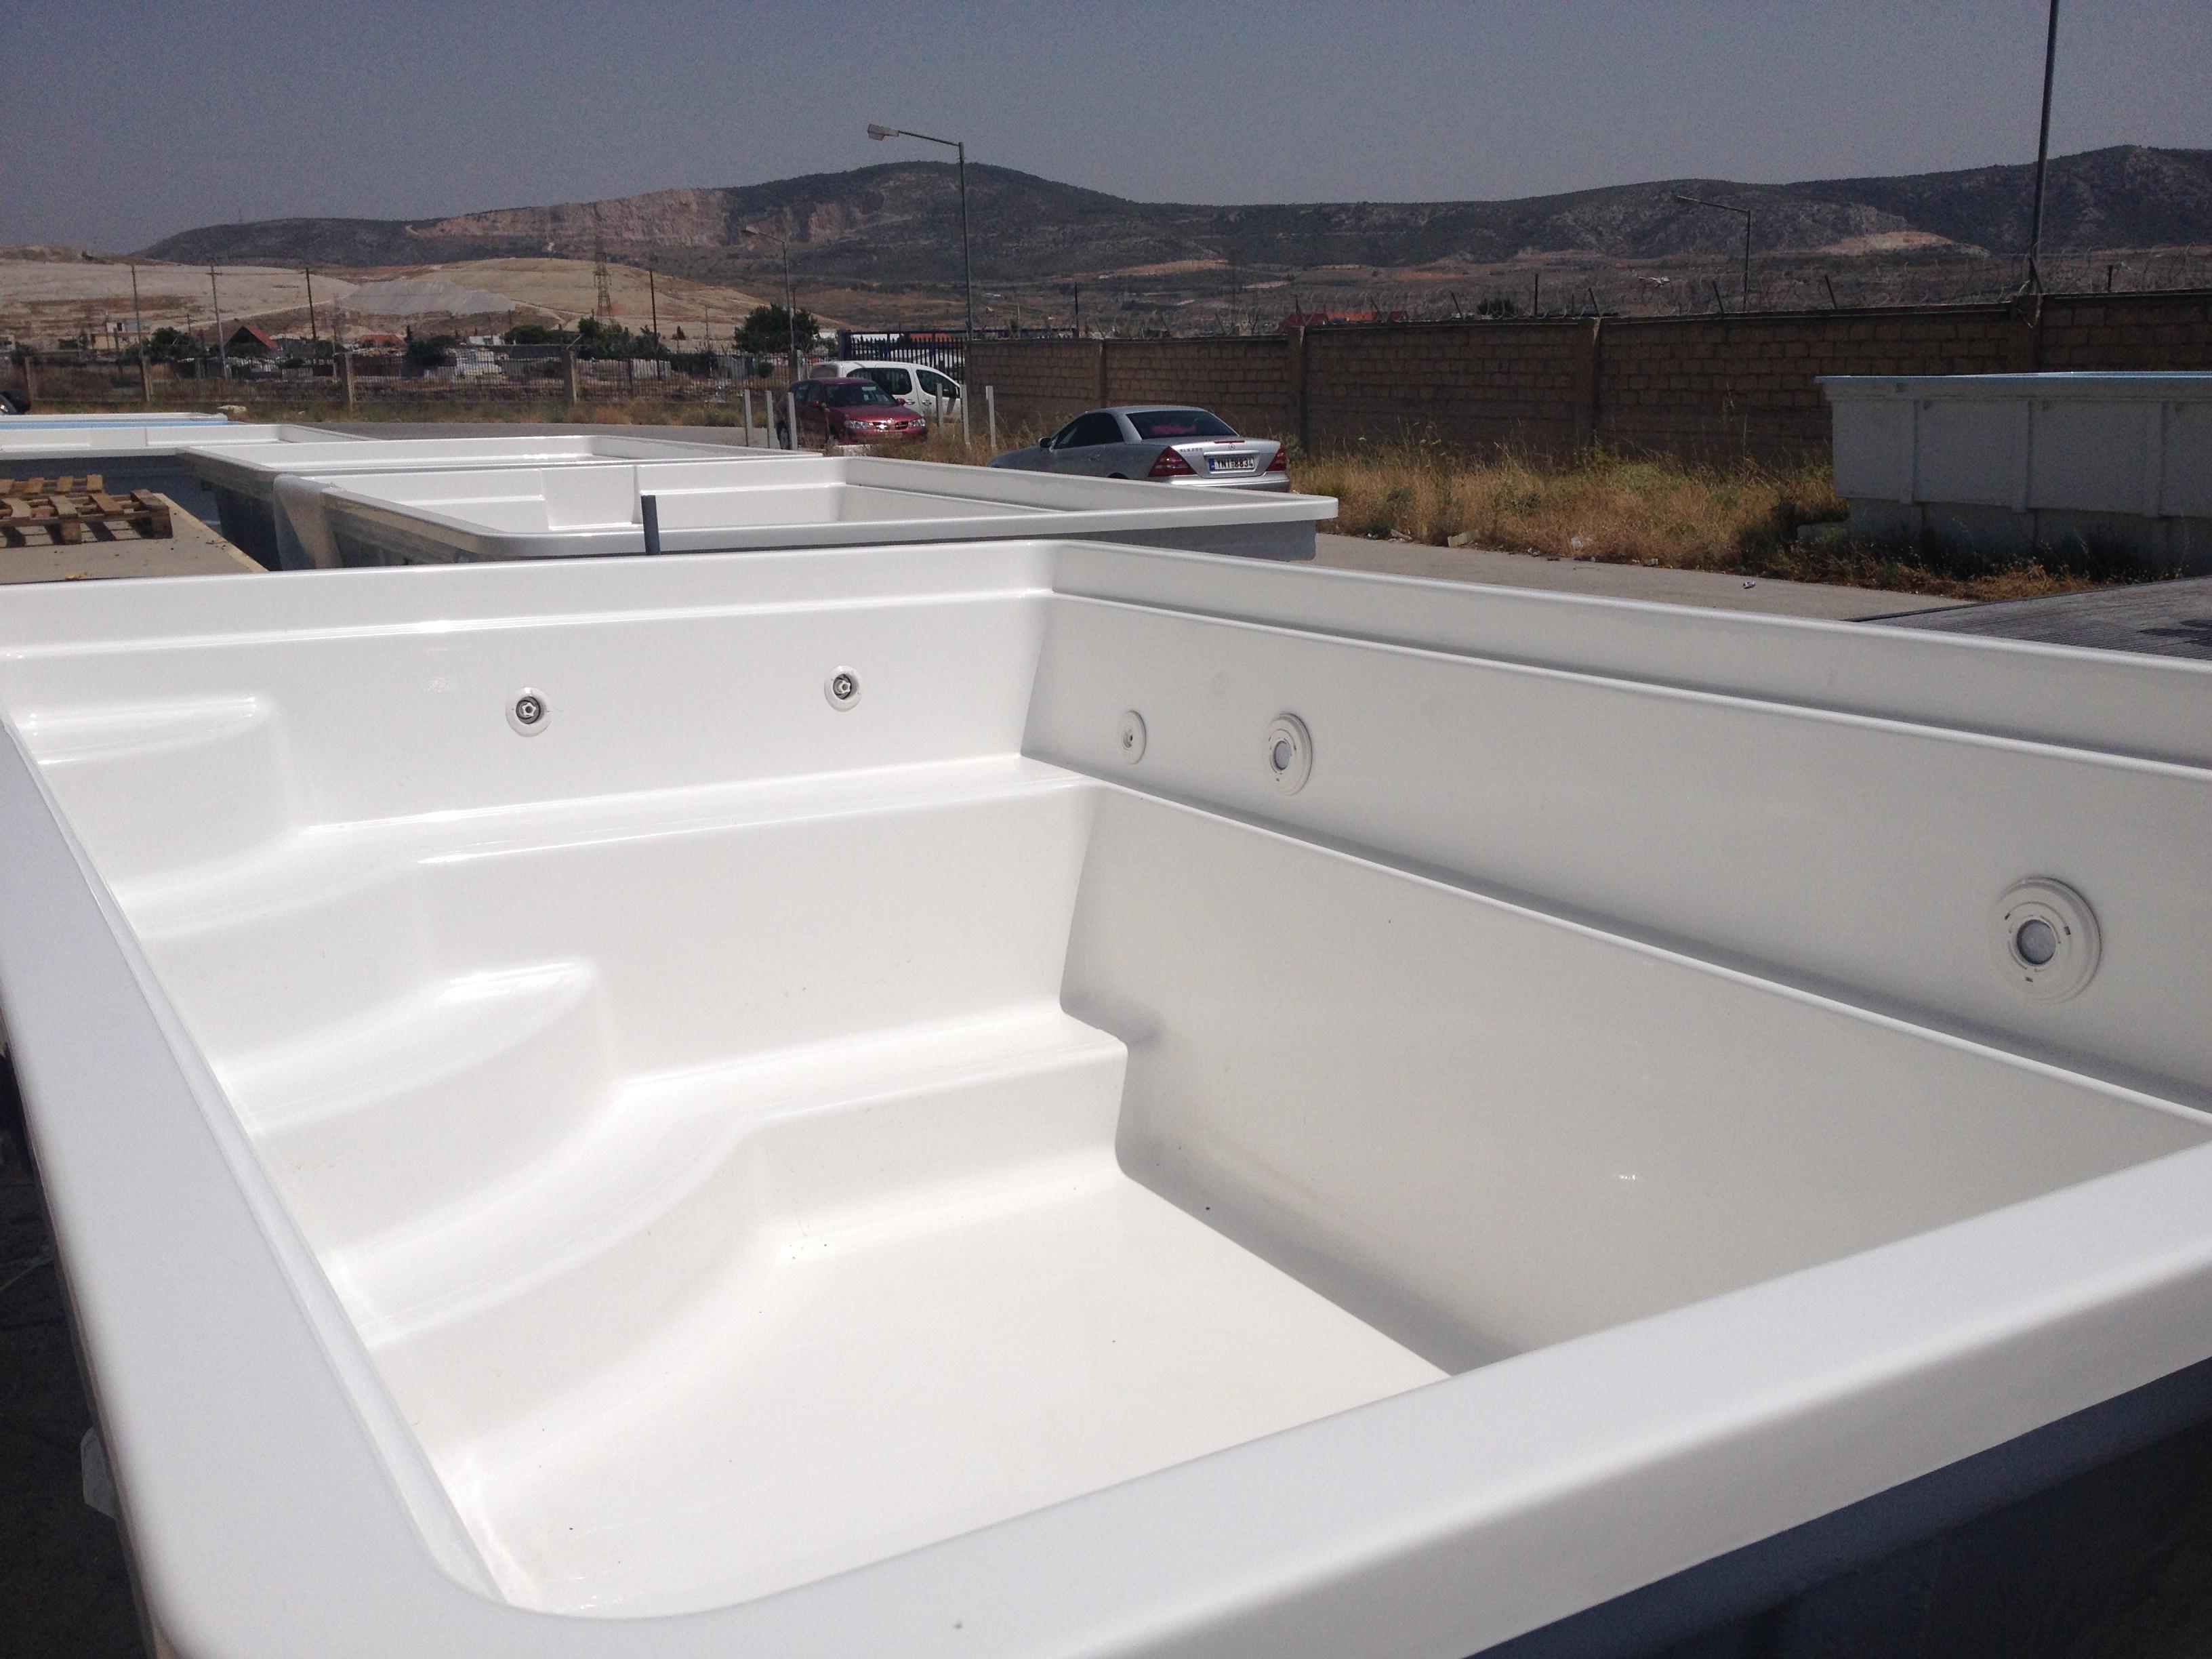 Spa - Ypsilon (Prefabricated swimming pool & Spa)